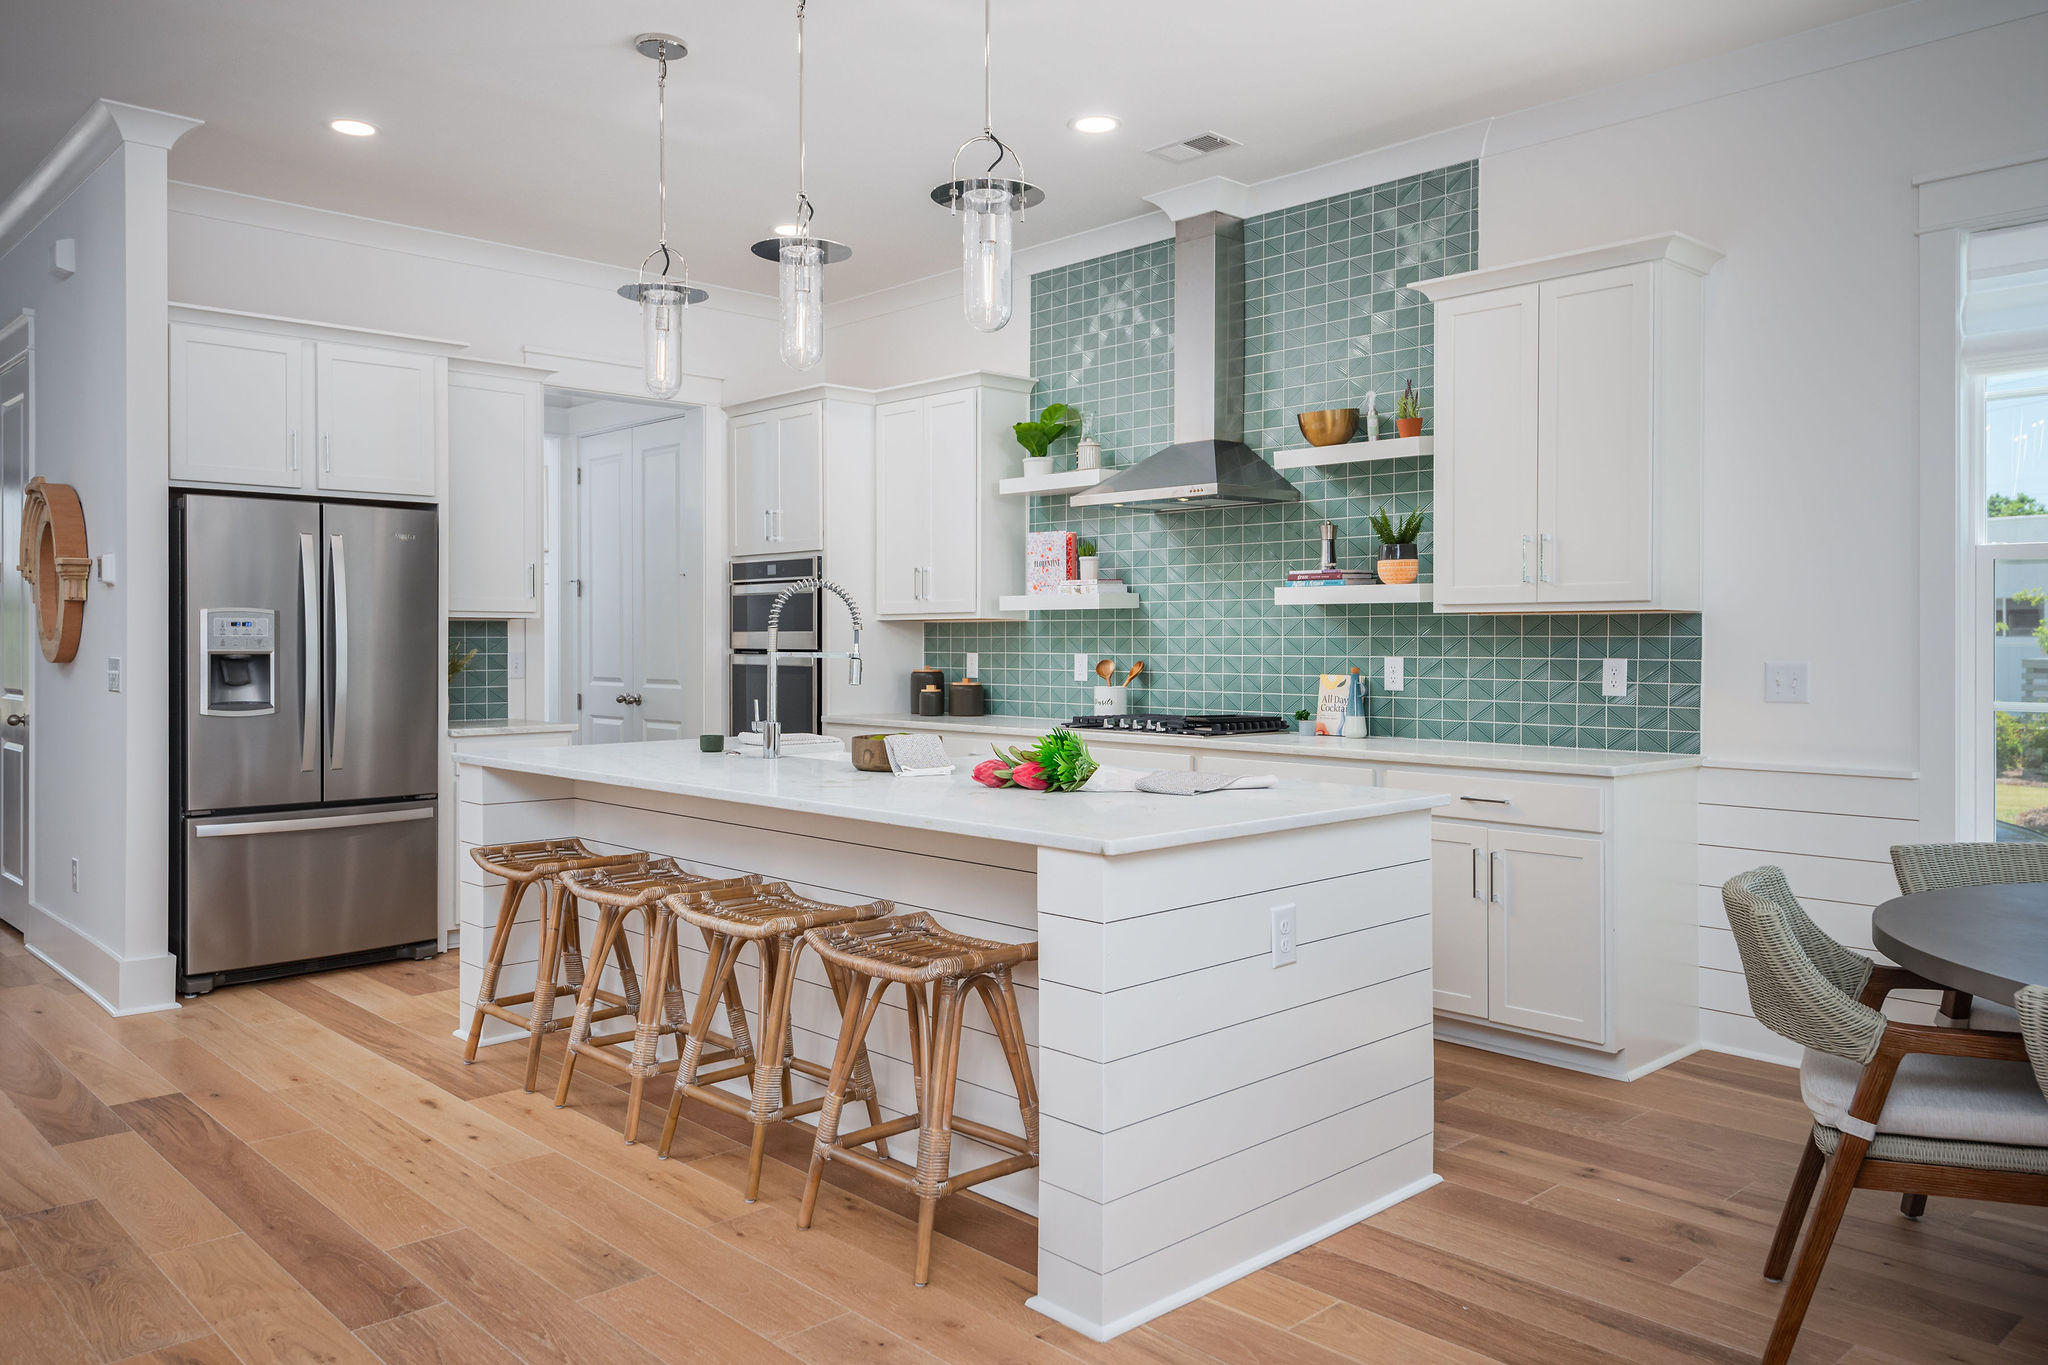 Midtown Homes For Sale - 1533 Kepley, Mount Pleasant, SC - 36